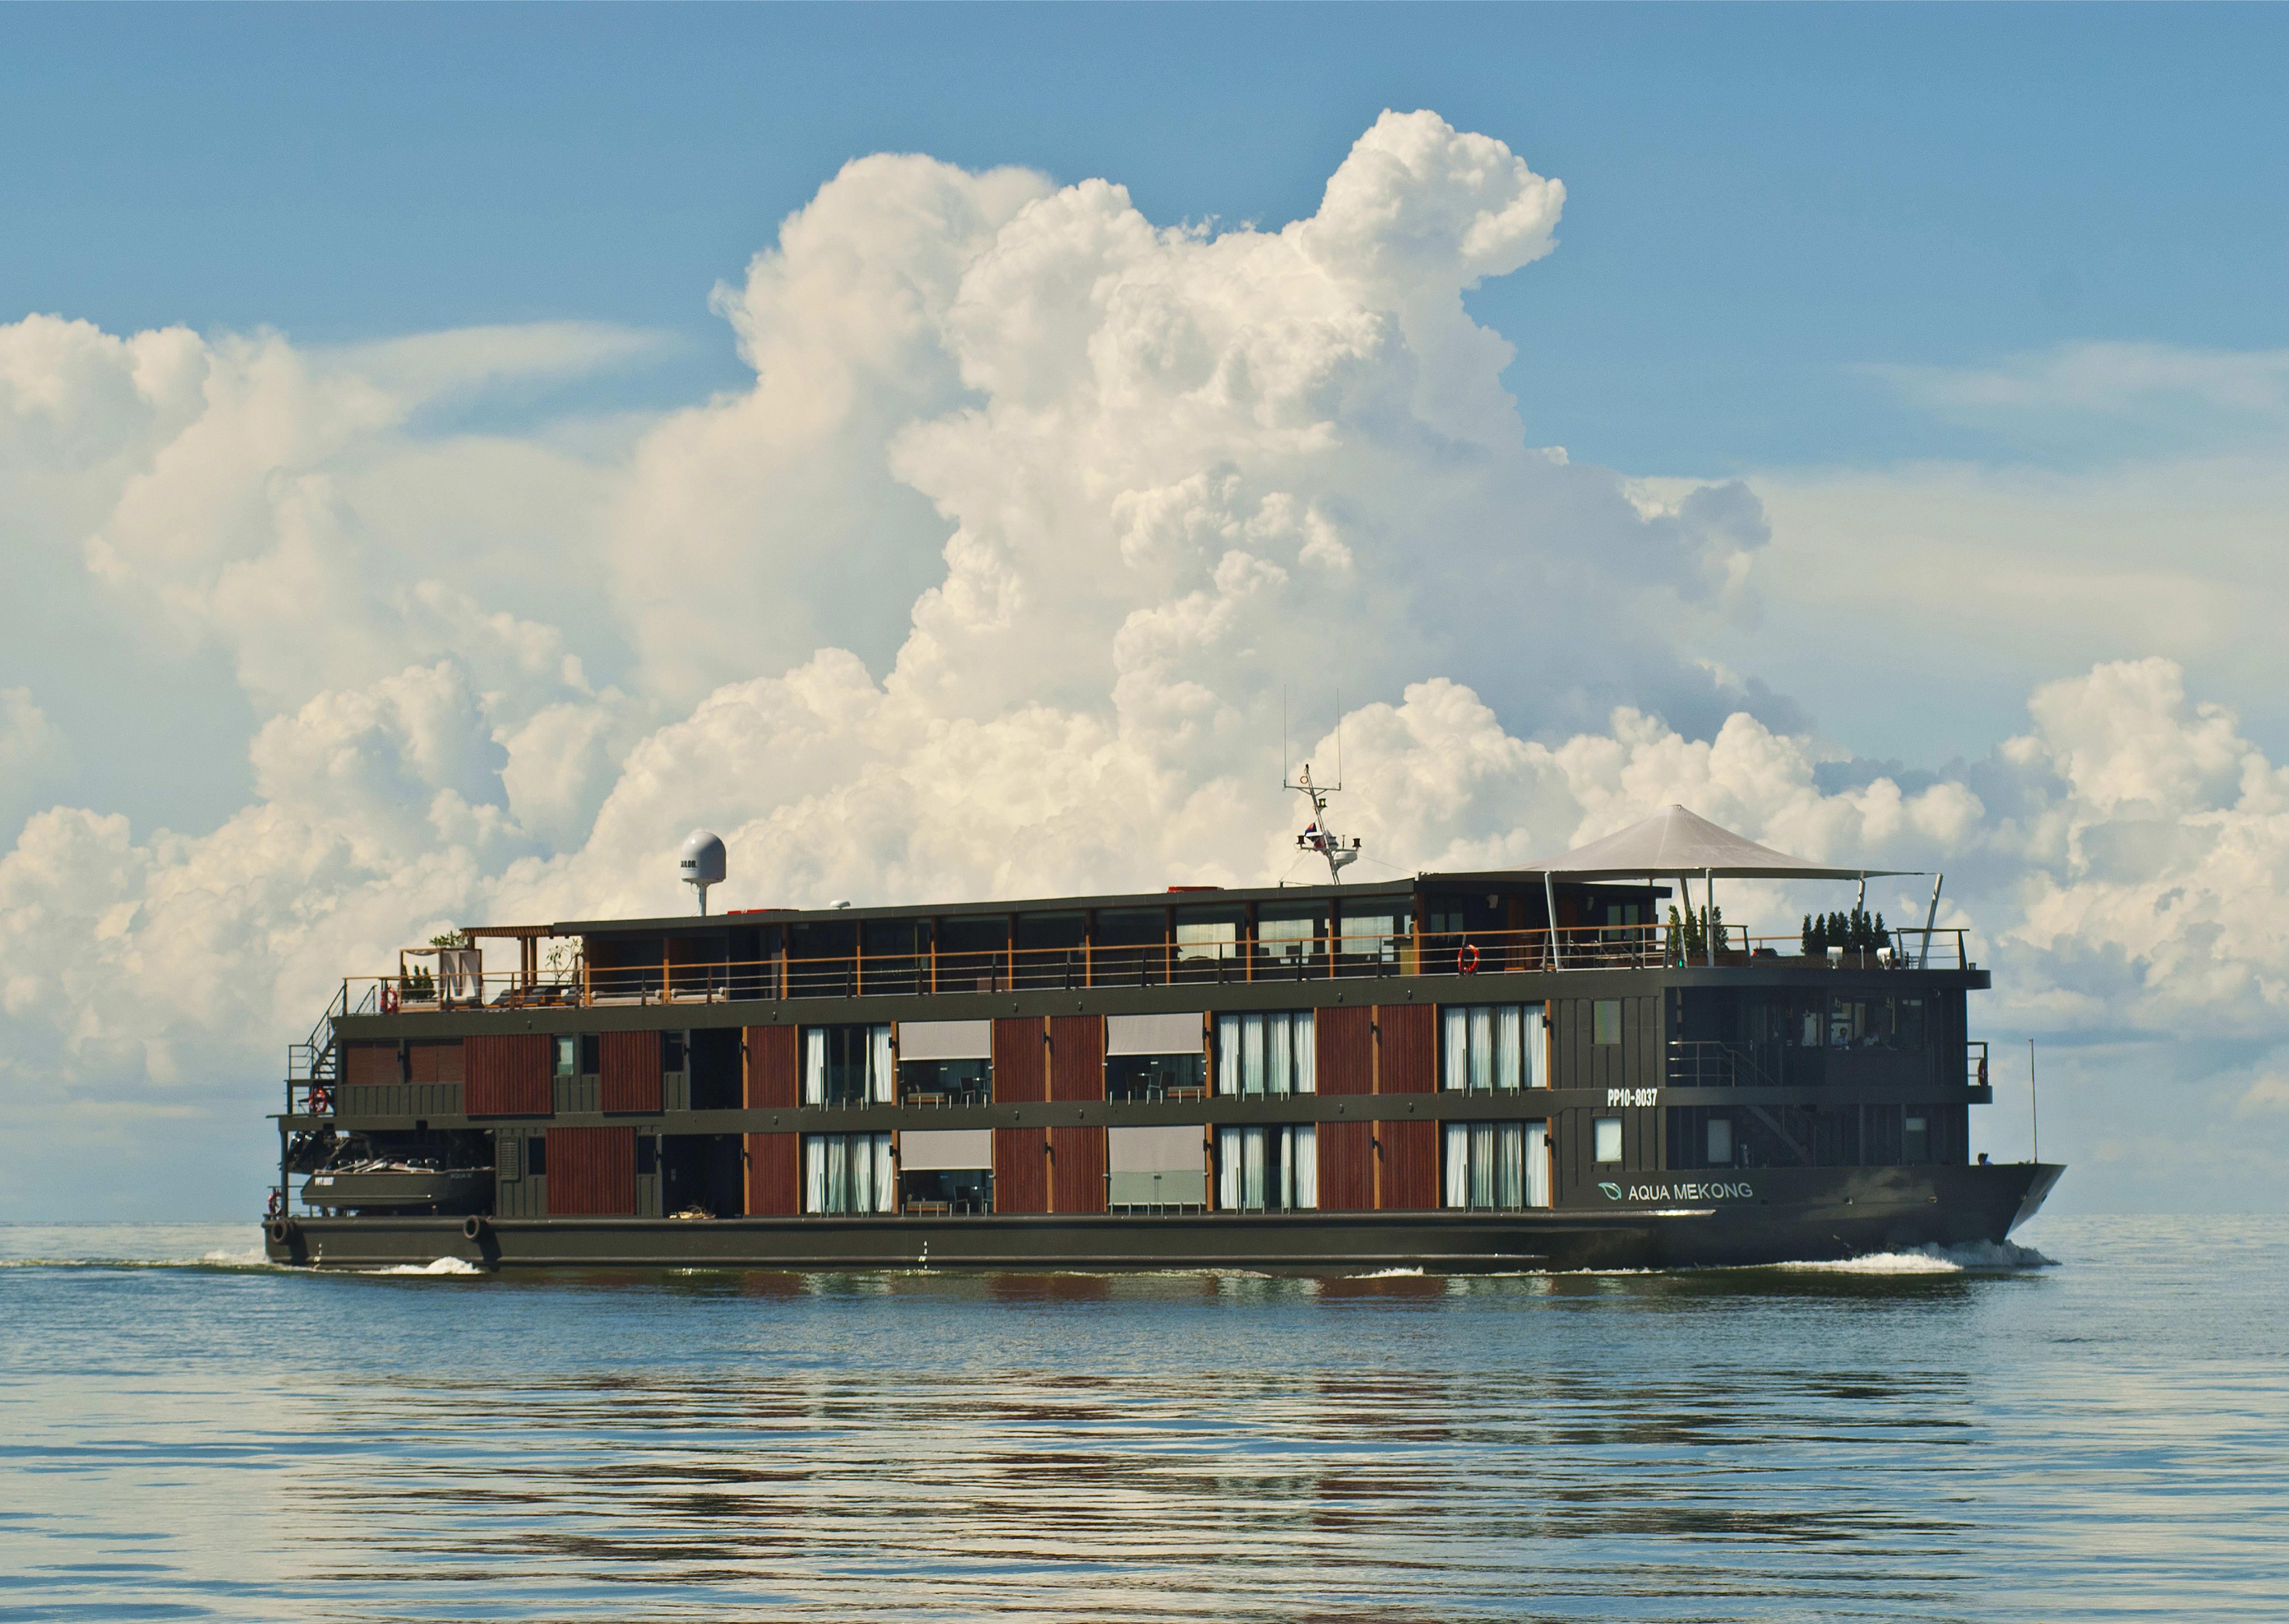 Image of Aqua Mekong 62.4M (204.7FT) motor yacht